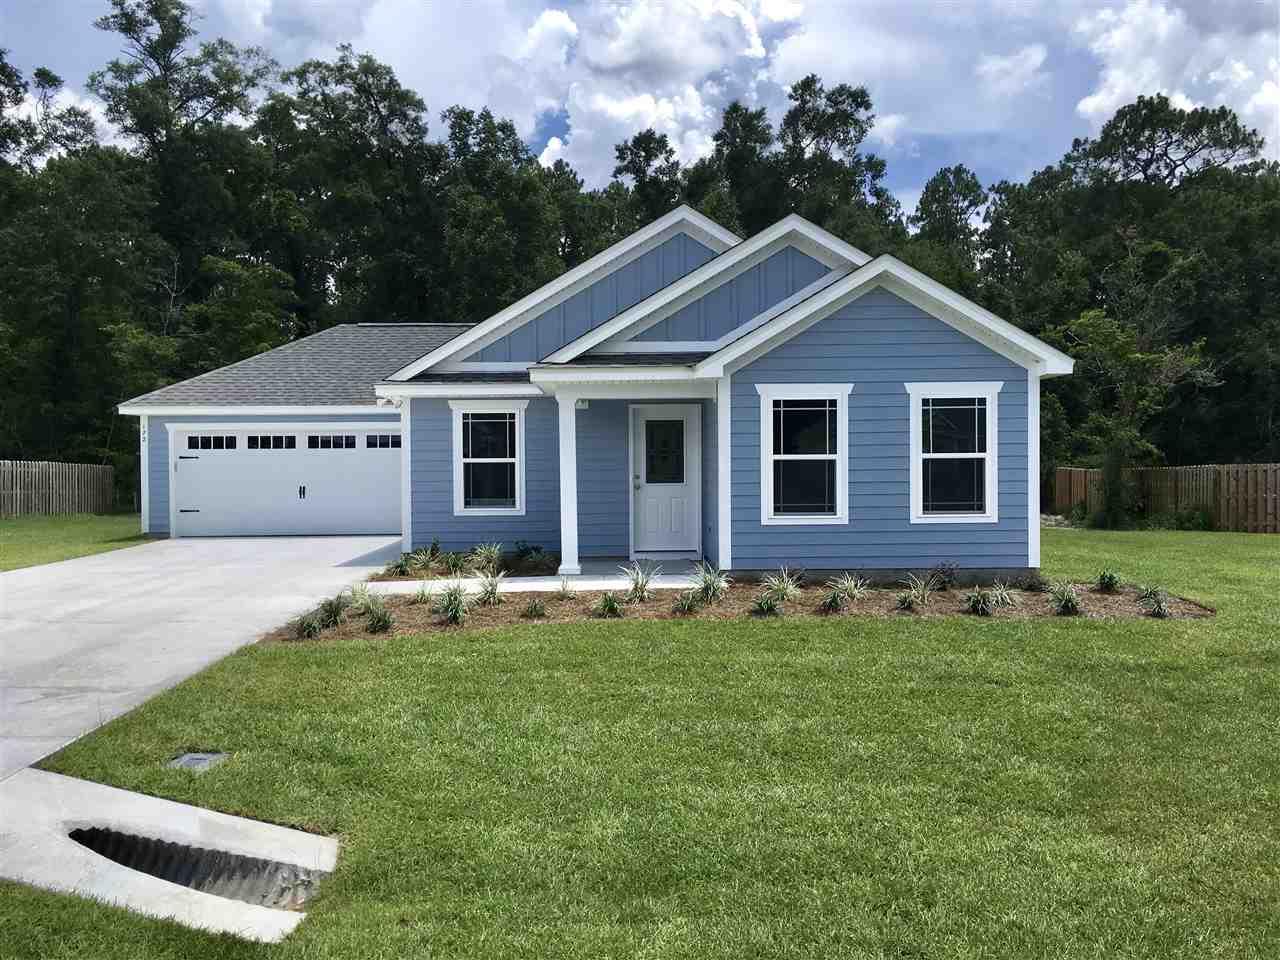 Property ID 290298